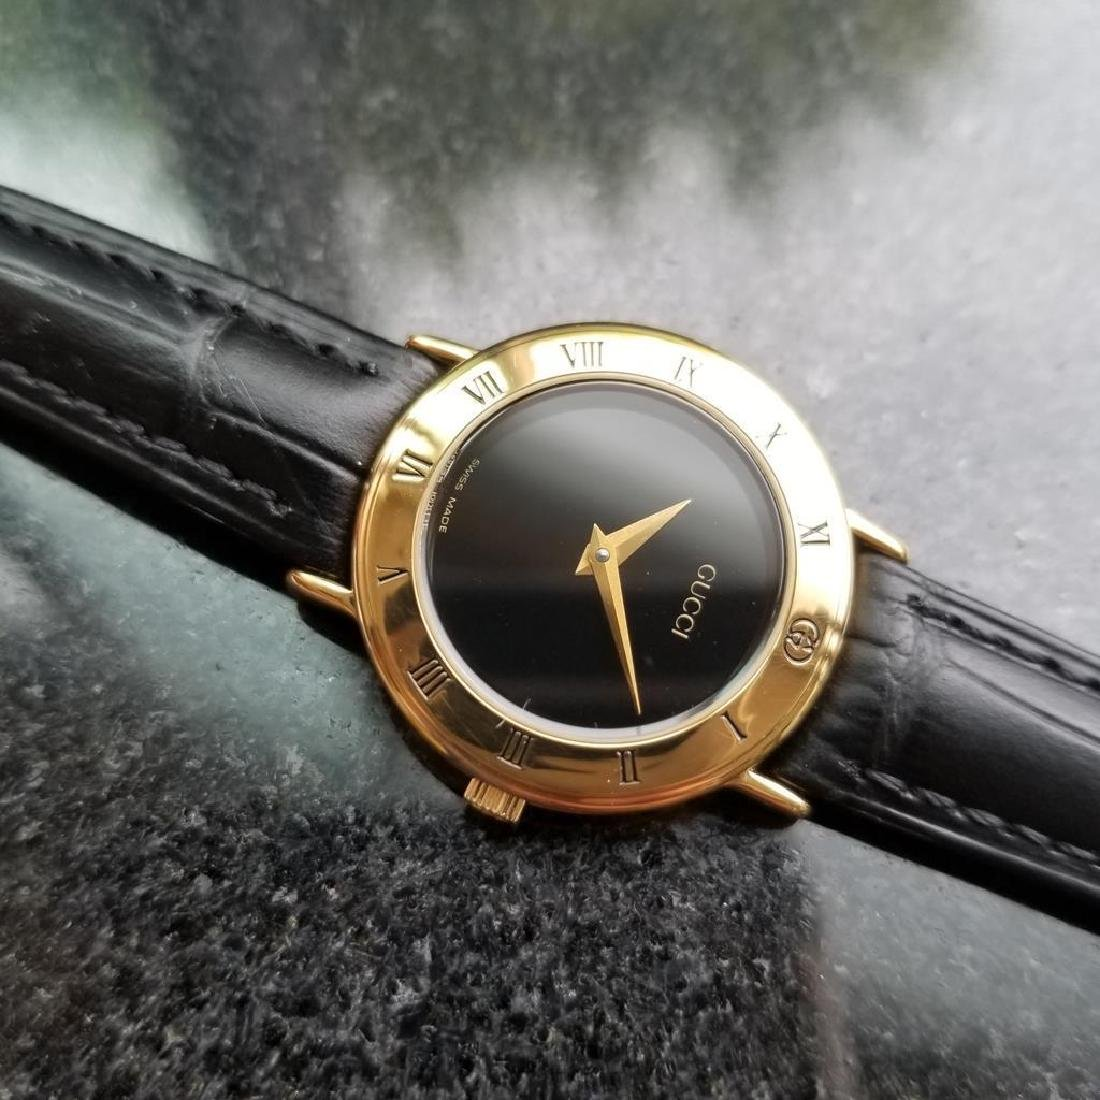 GUCCI Ladies Gold-Plated 3000.2.L Lux Swiss Dress Watch - 7